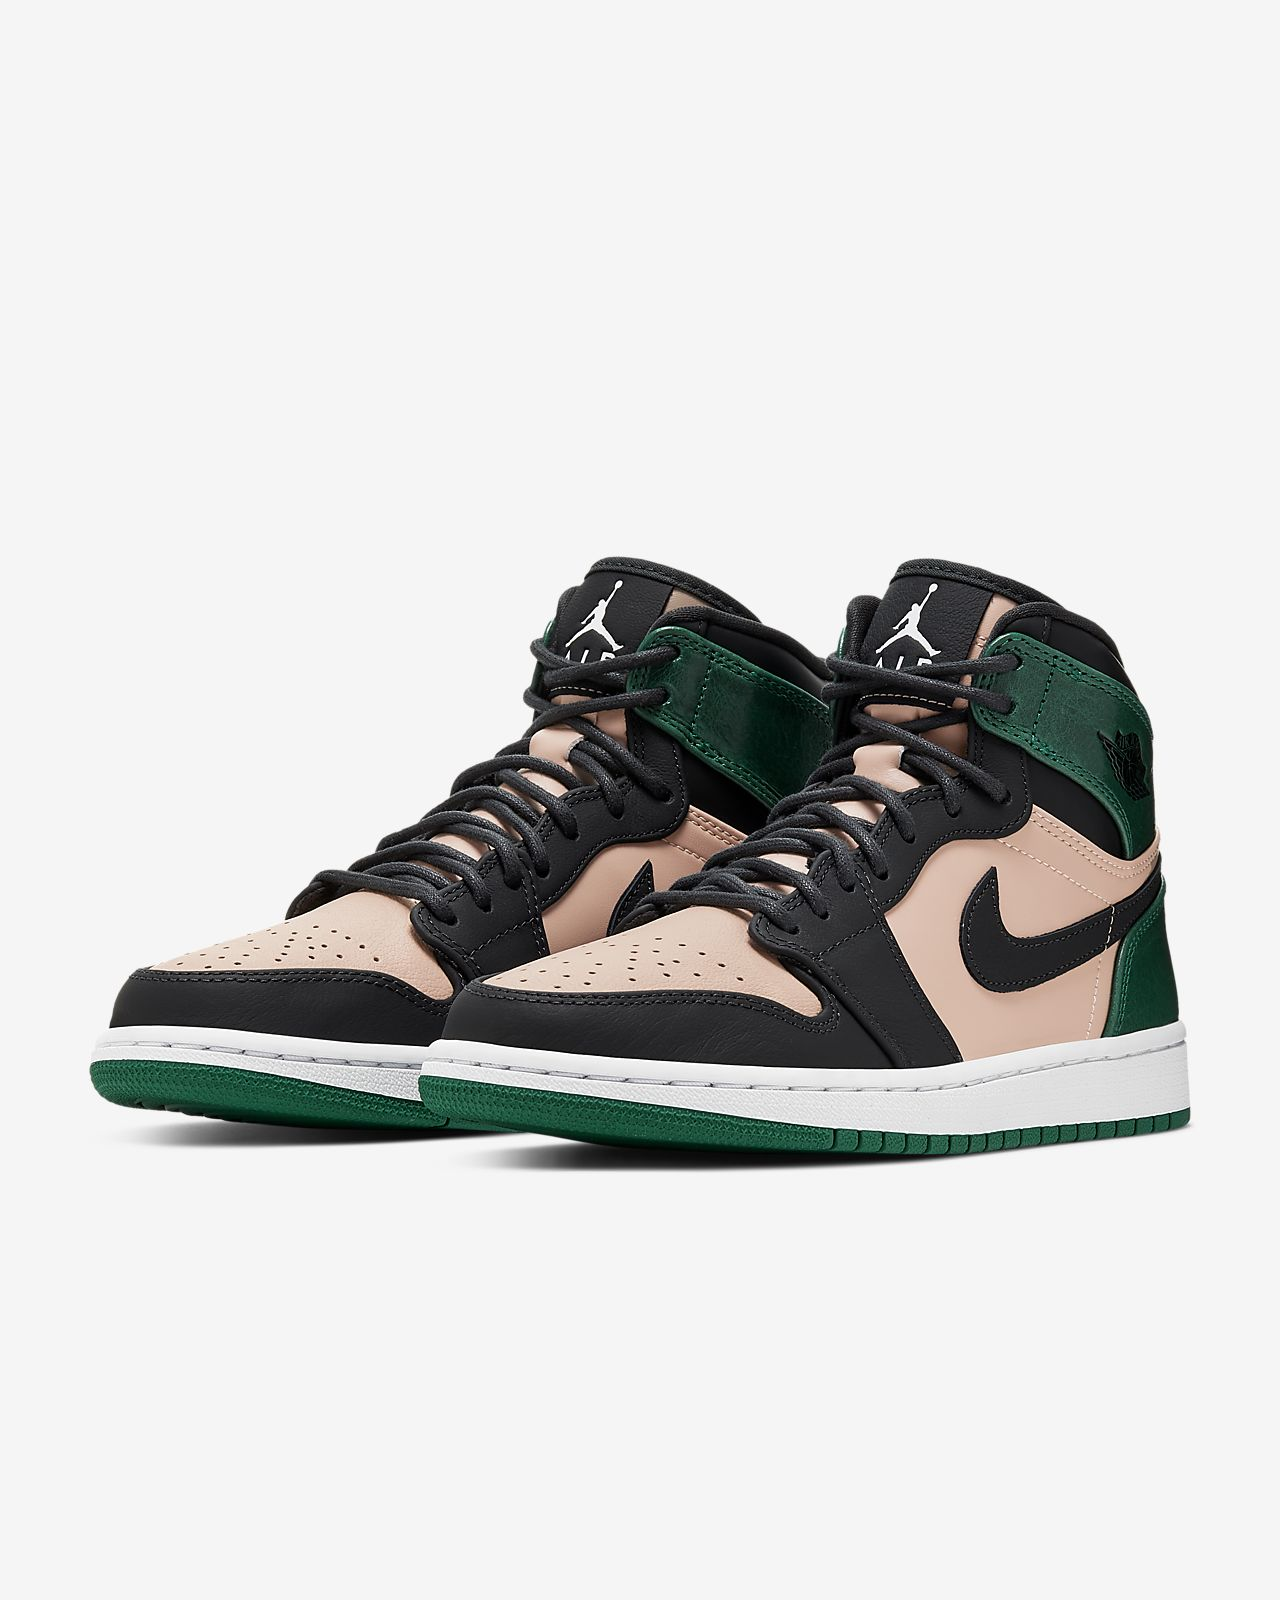 new arrival 8d61c 76ba0 ... Nike Air Jordan 1 Retro High Premium Women s Shoe